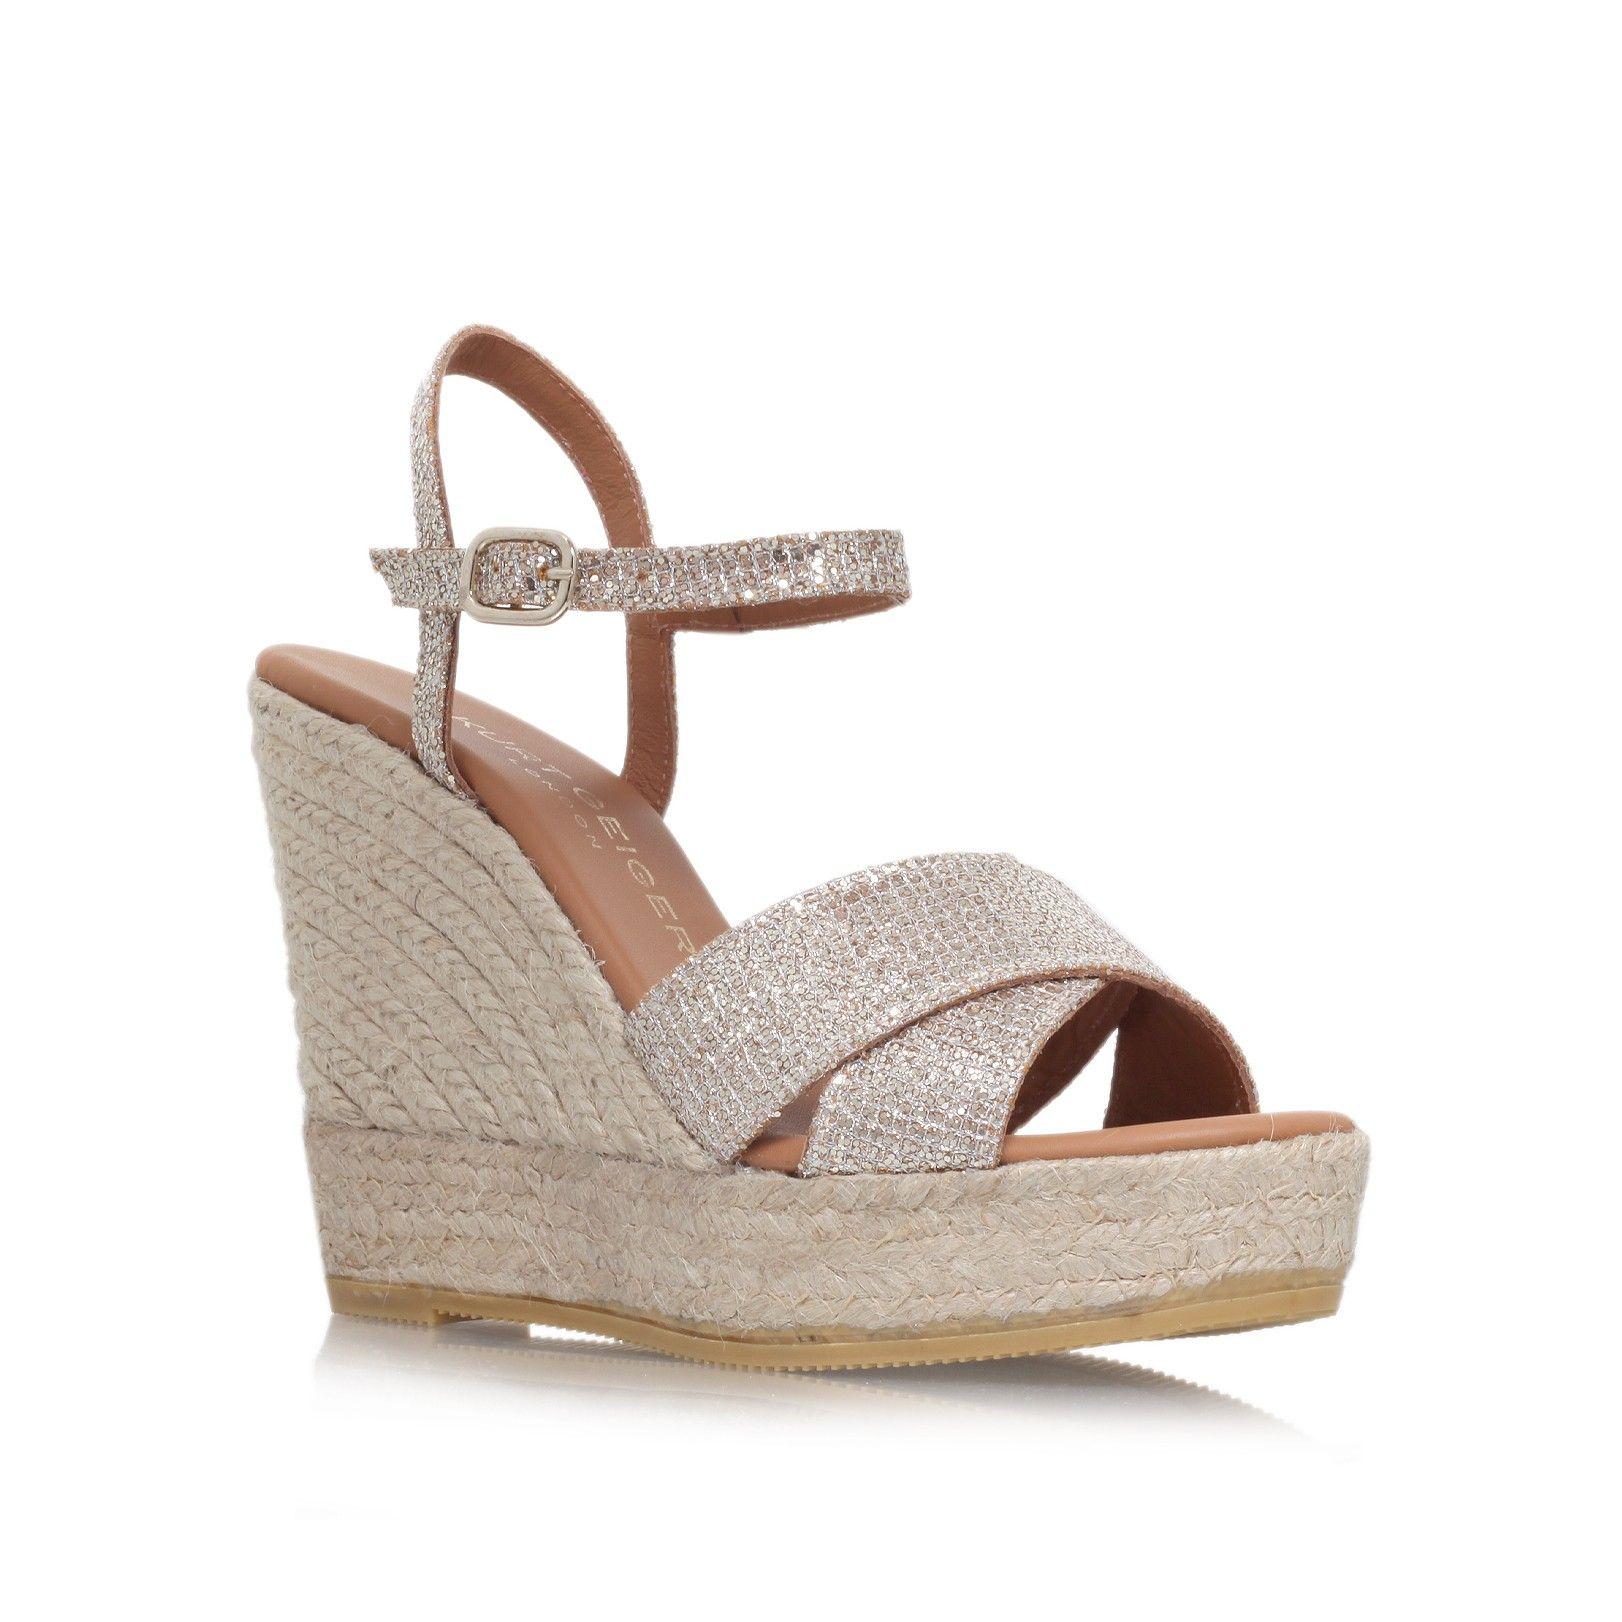 Footwear · amerie peach high heel wedge sandals from Kurt Geiger London